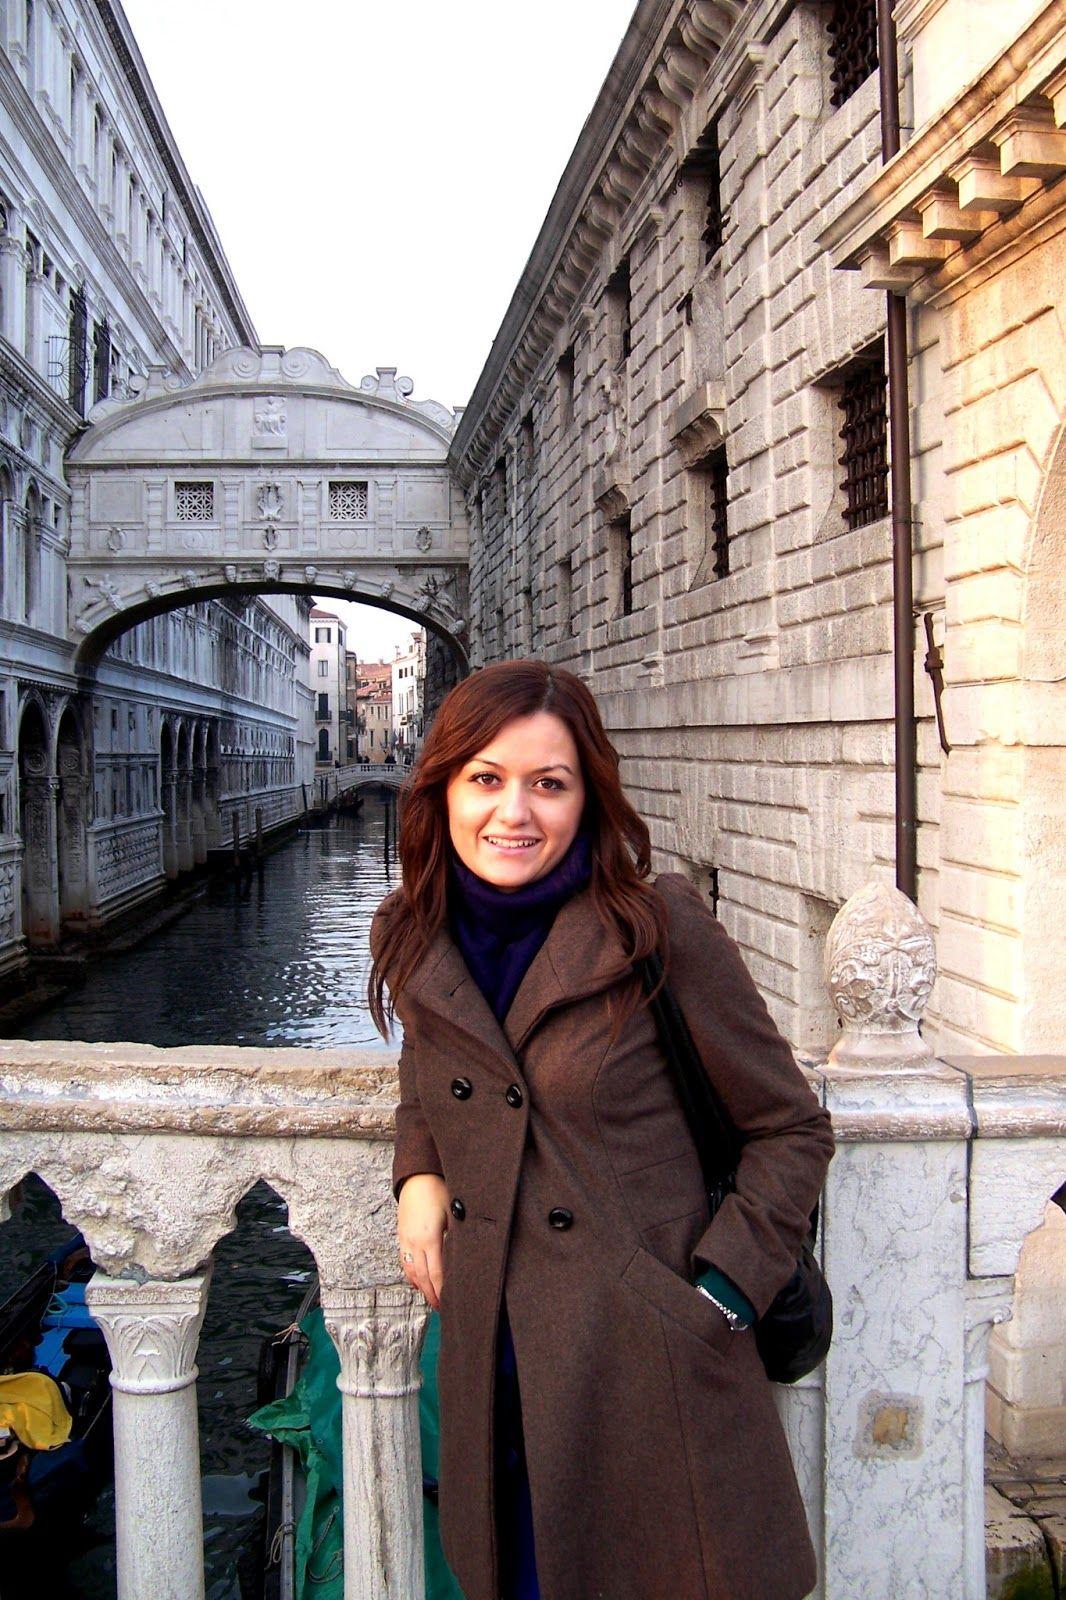 Venezia, cara mia! Travel memories from Italia. #venezia #italia #travel #traveller #venice #italy